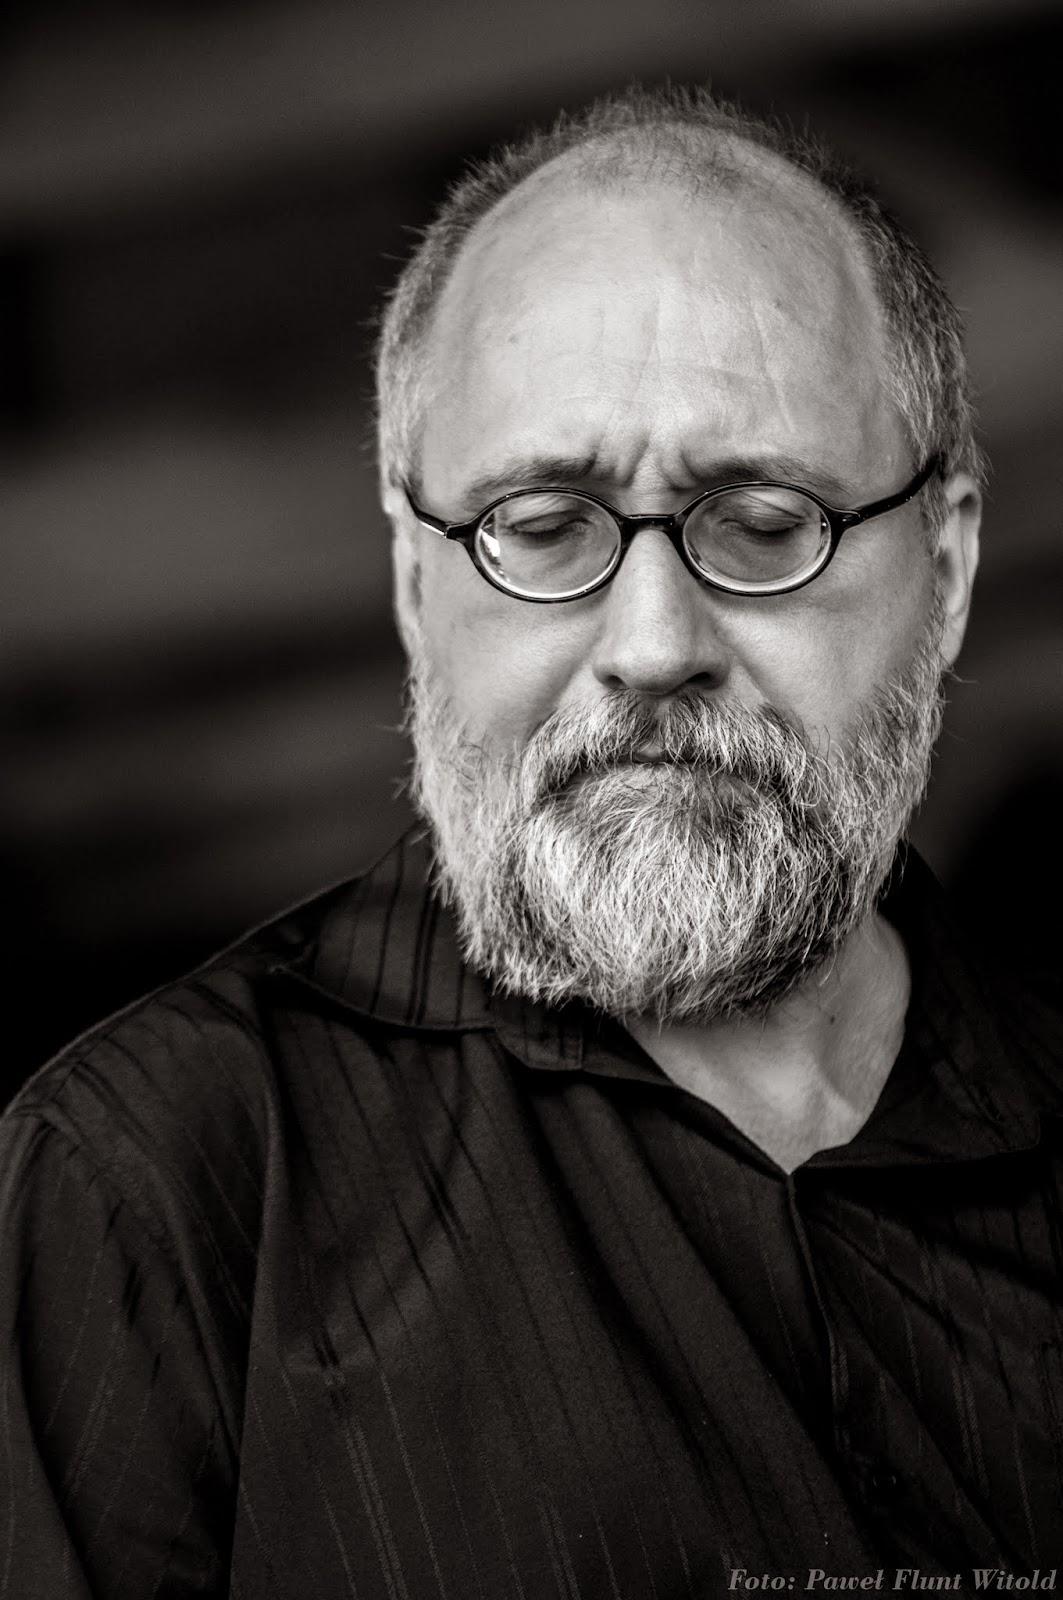 Foto: Paweł Flunt Witold